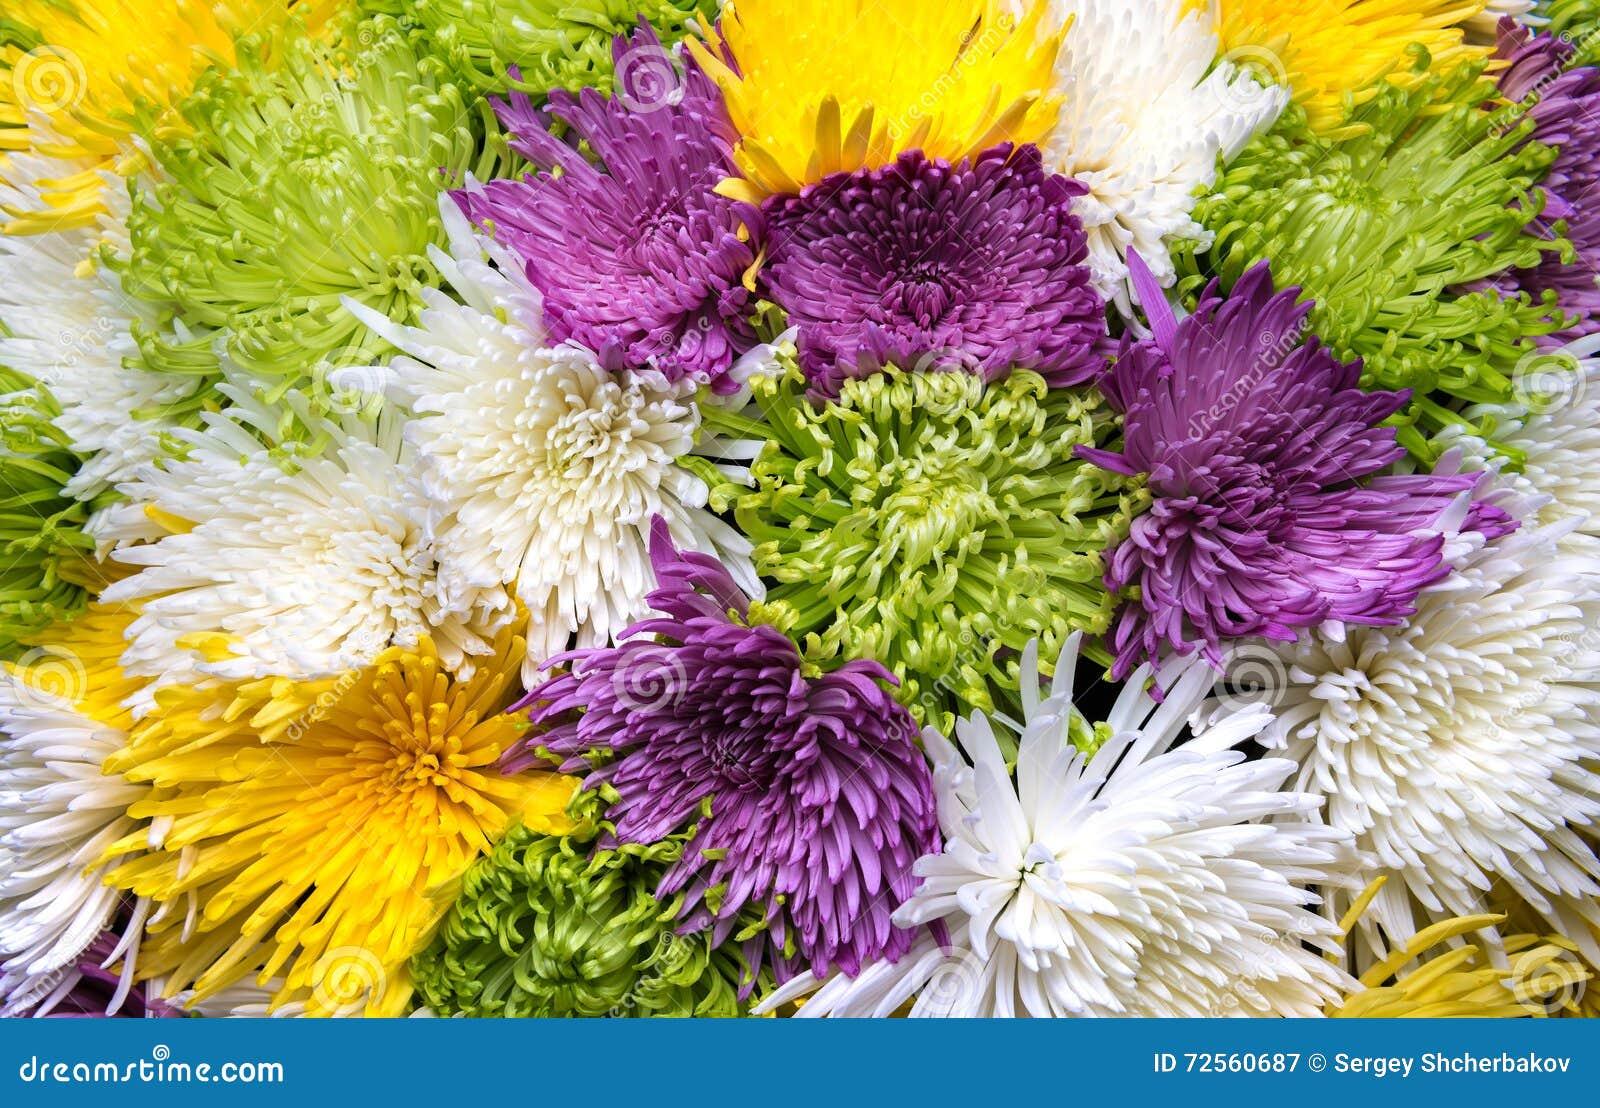 Aster flowers bouquet closeup stock image image of closeup autumn aster flowers bouquet closeup izmirmasajfo